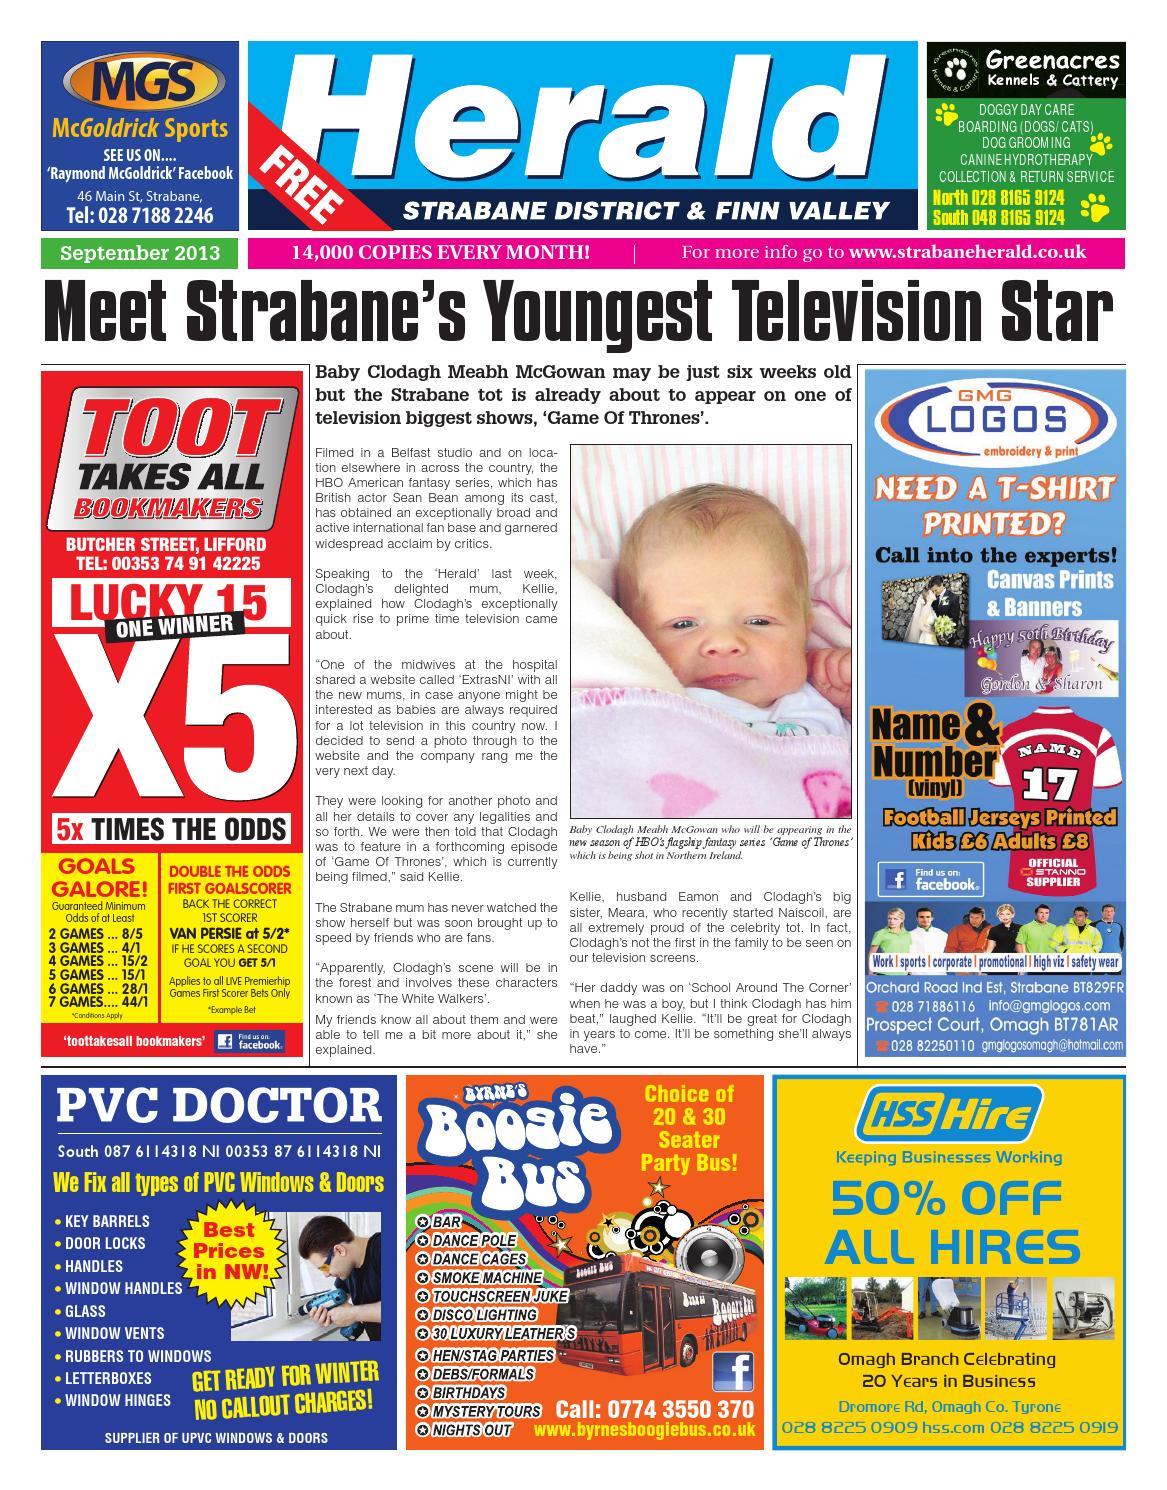 Strabane Herald September 2013 Edition by Neil Murray - issuu